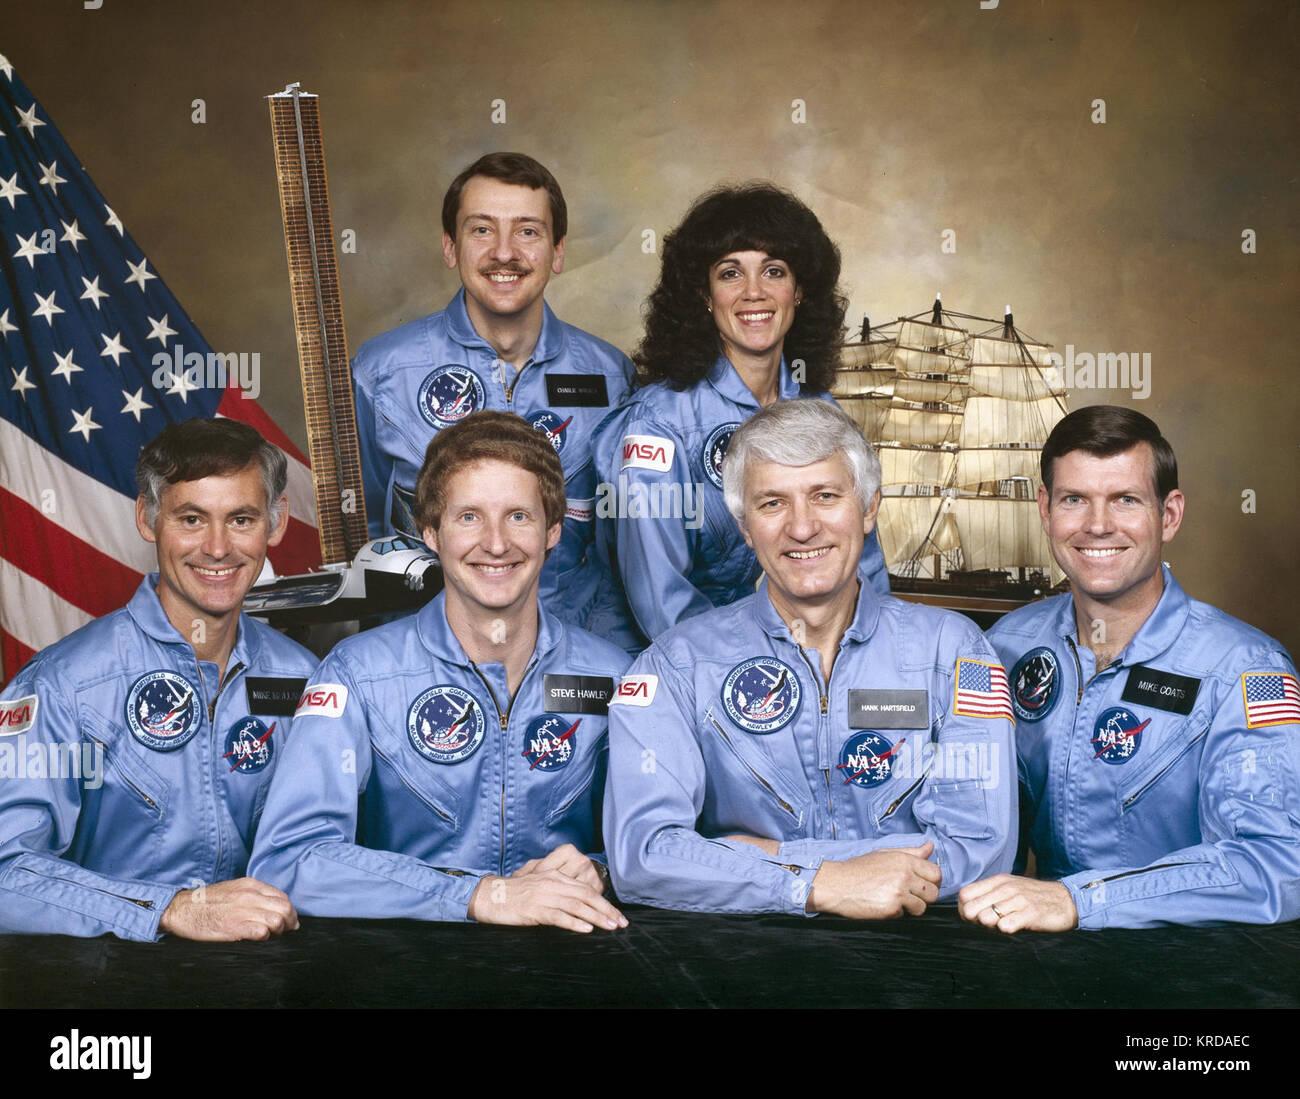 STS-41-D CREW PORTRAIT: FRONT L-R: RICHARD M MULLANE; STEVEN A. HAWLEY; HENRY W. HARTSFIELD; MICHAEL P. COATS; BACK - Stock Image